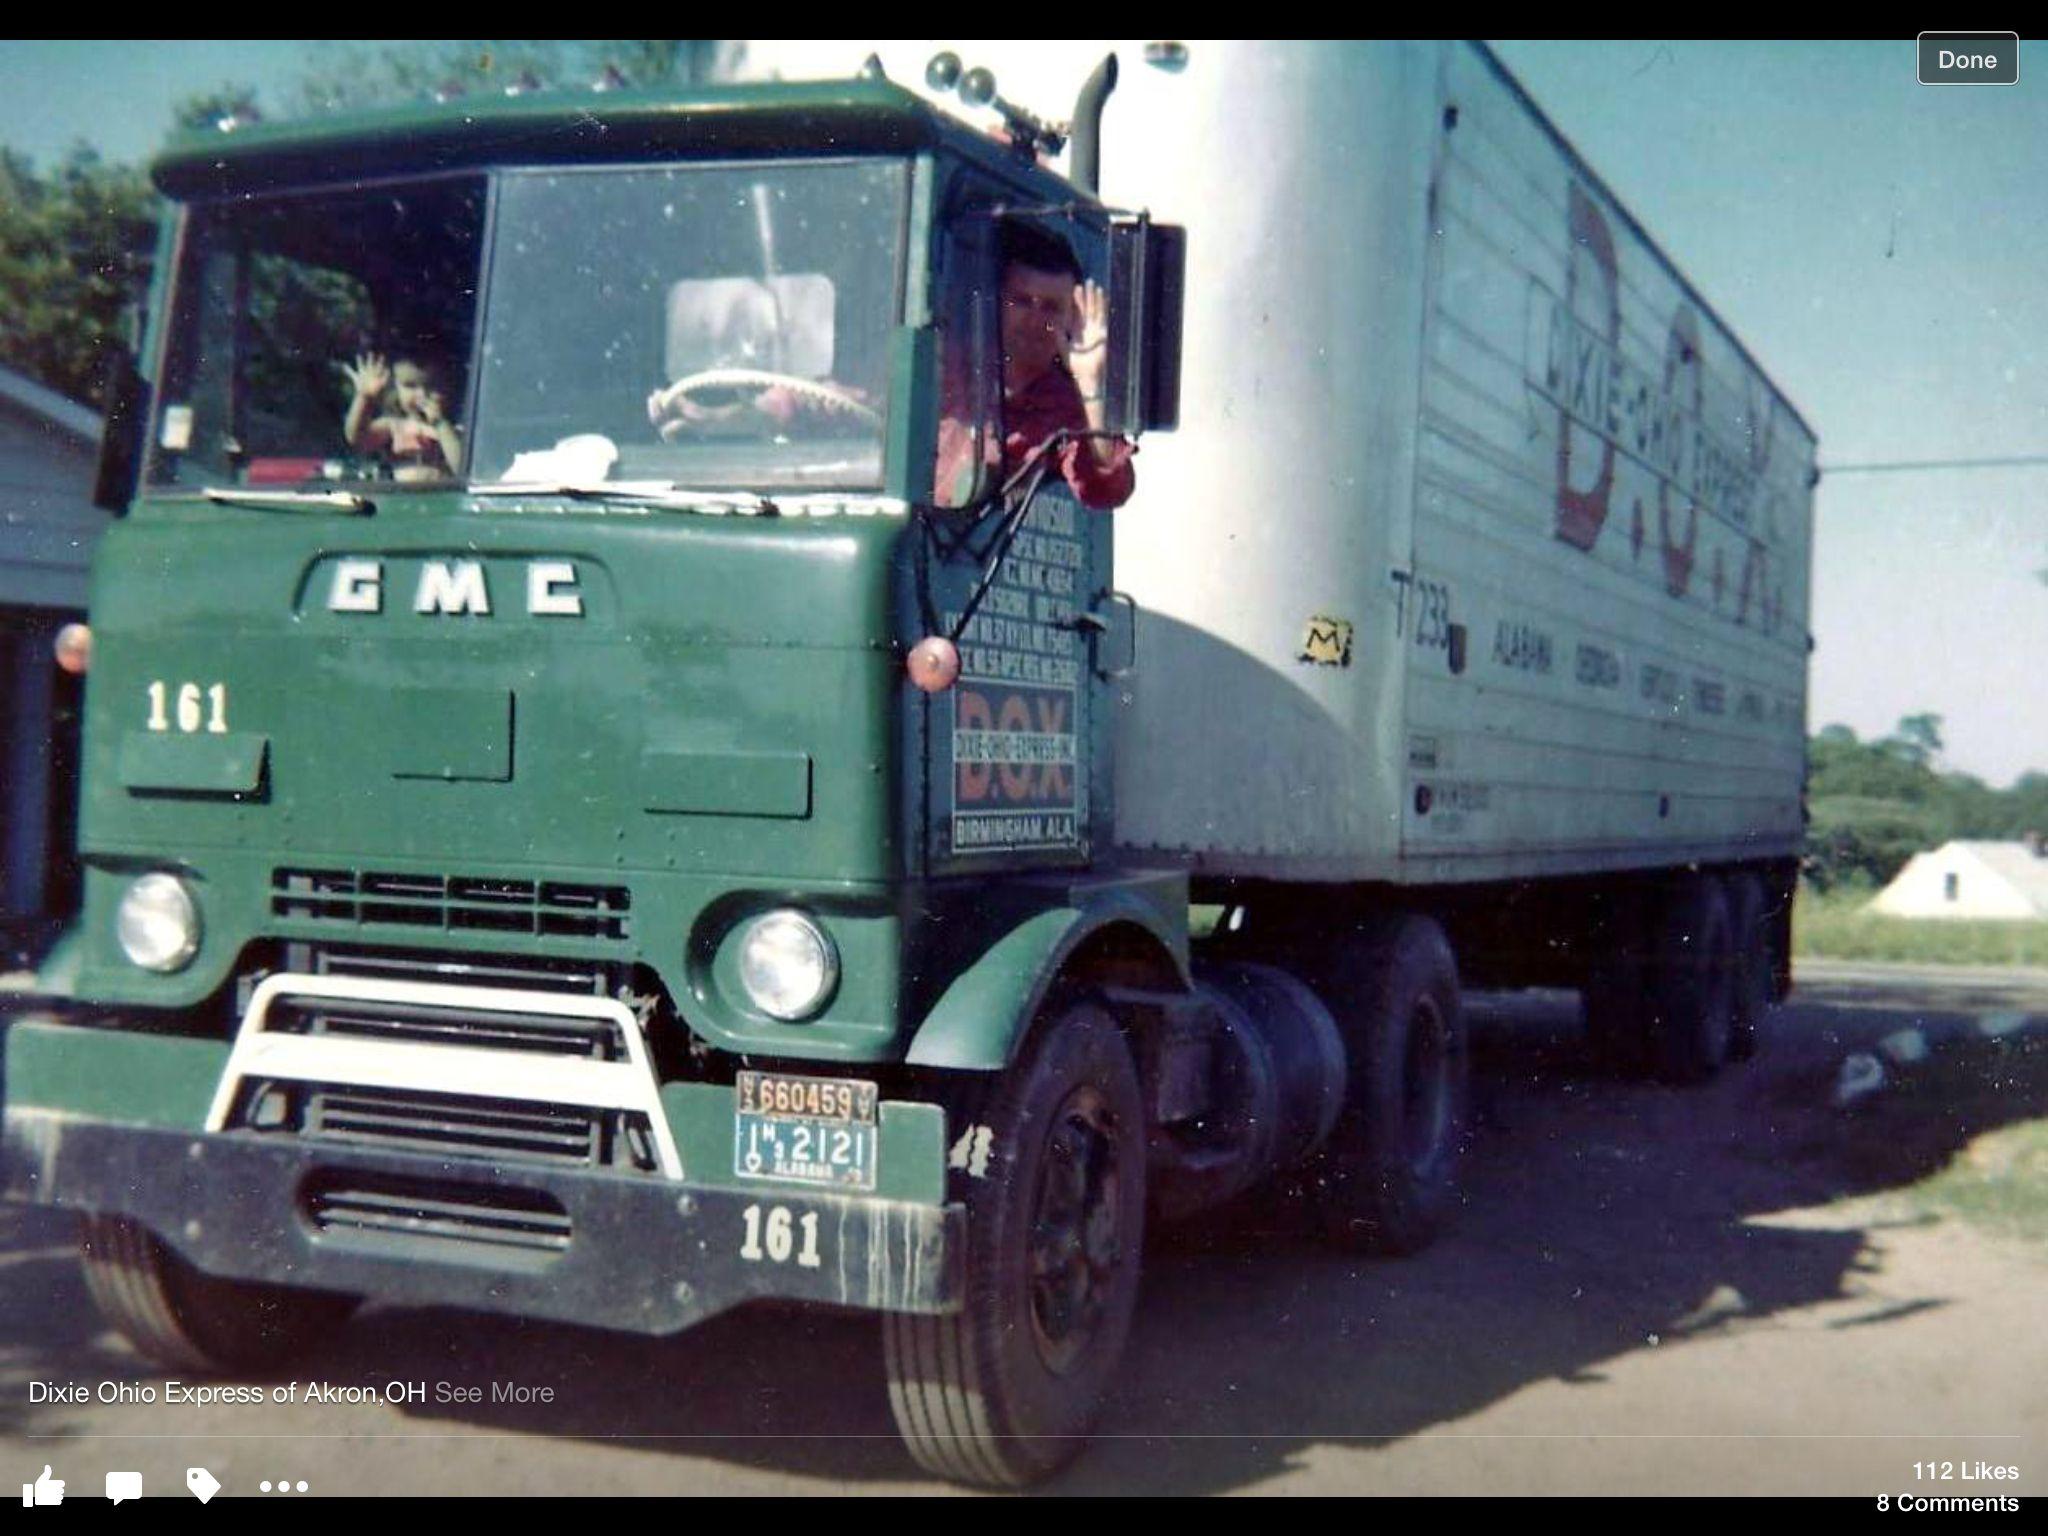 Dixie Ohio Express Vintage Trucks Truck Transport Cool Trucks